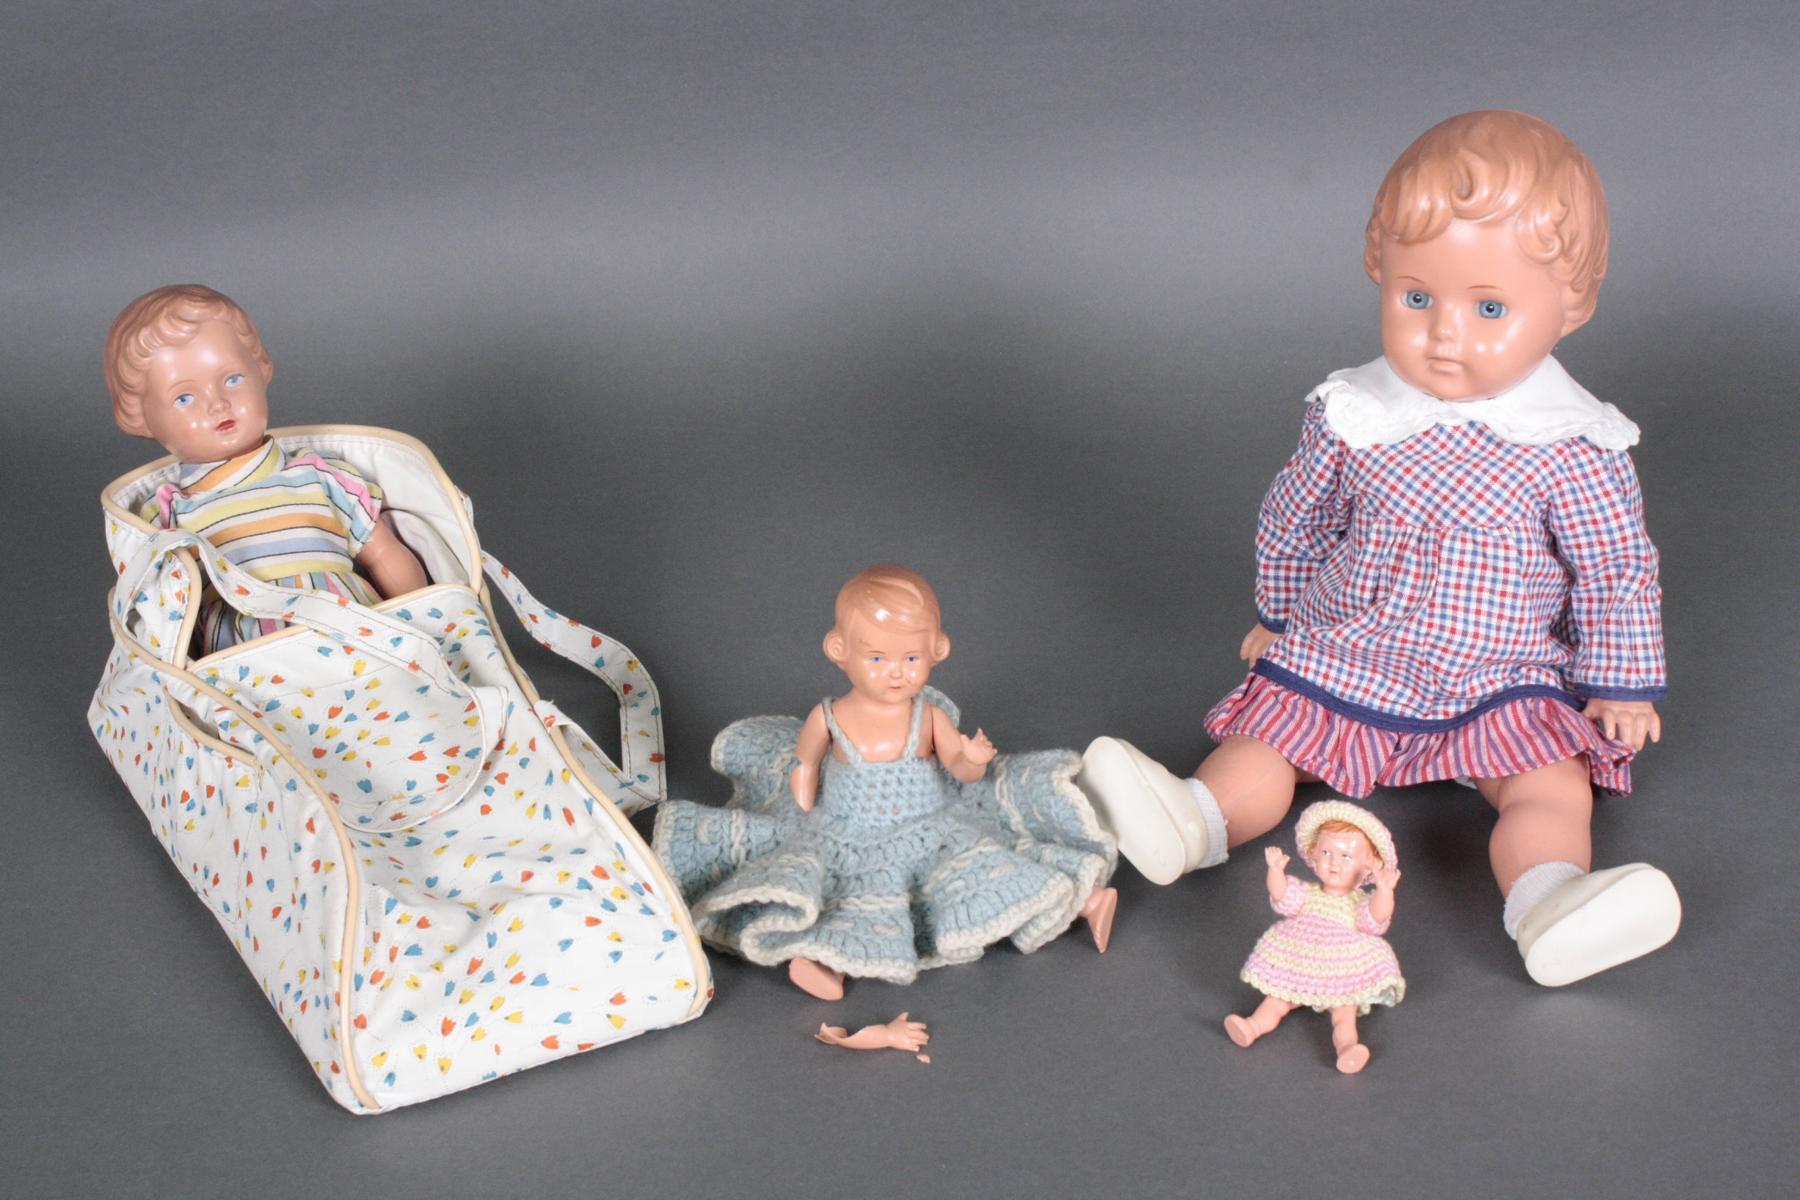 Vier Celluloid Puppen-Mädchen-2